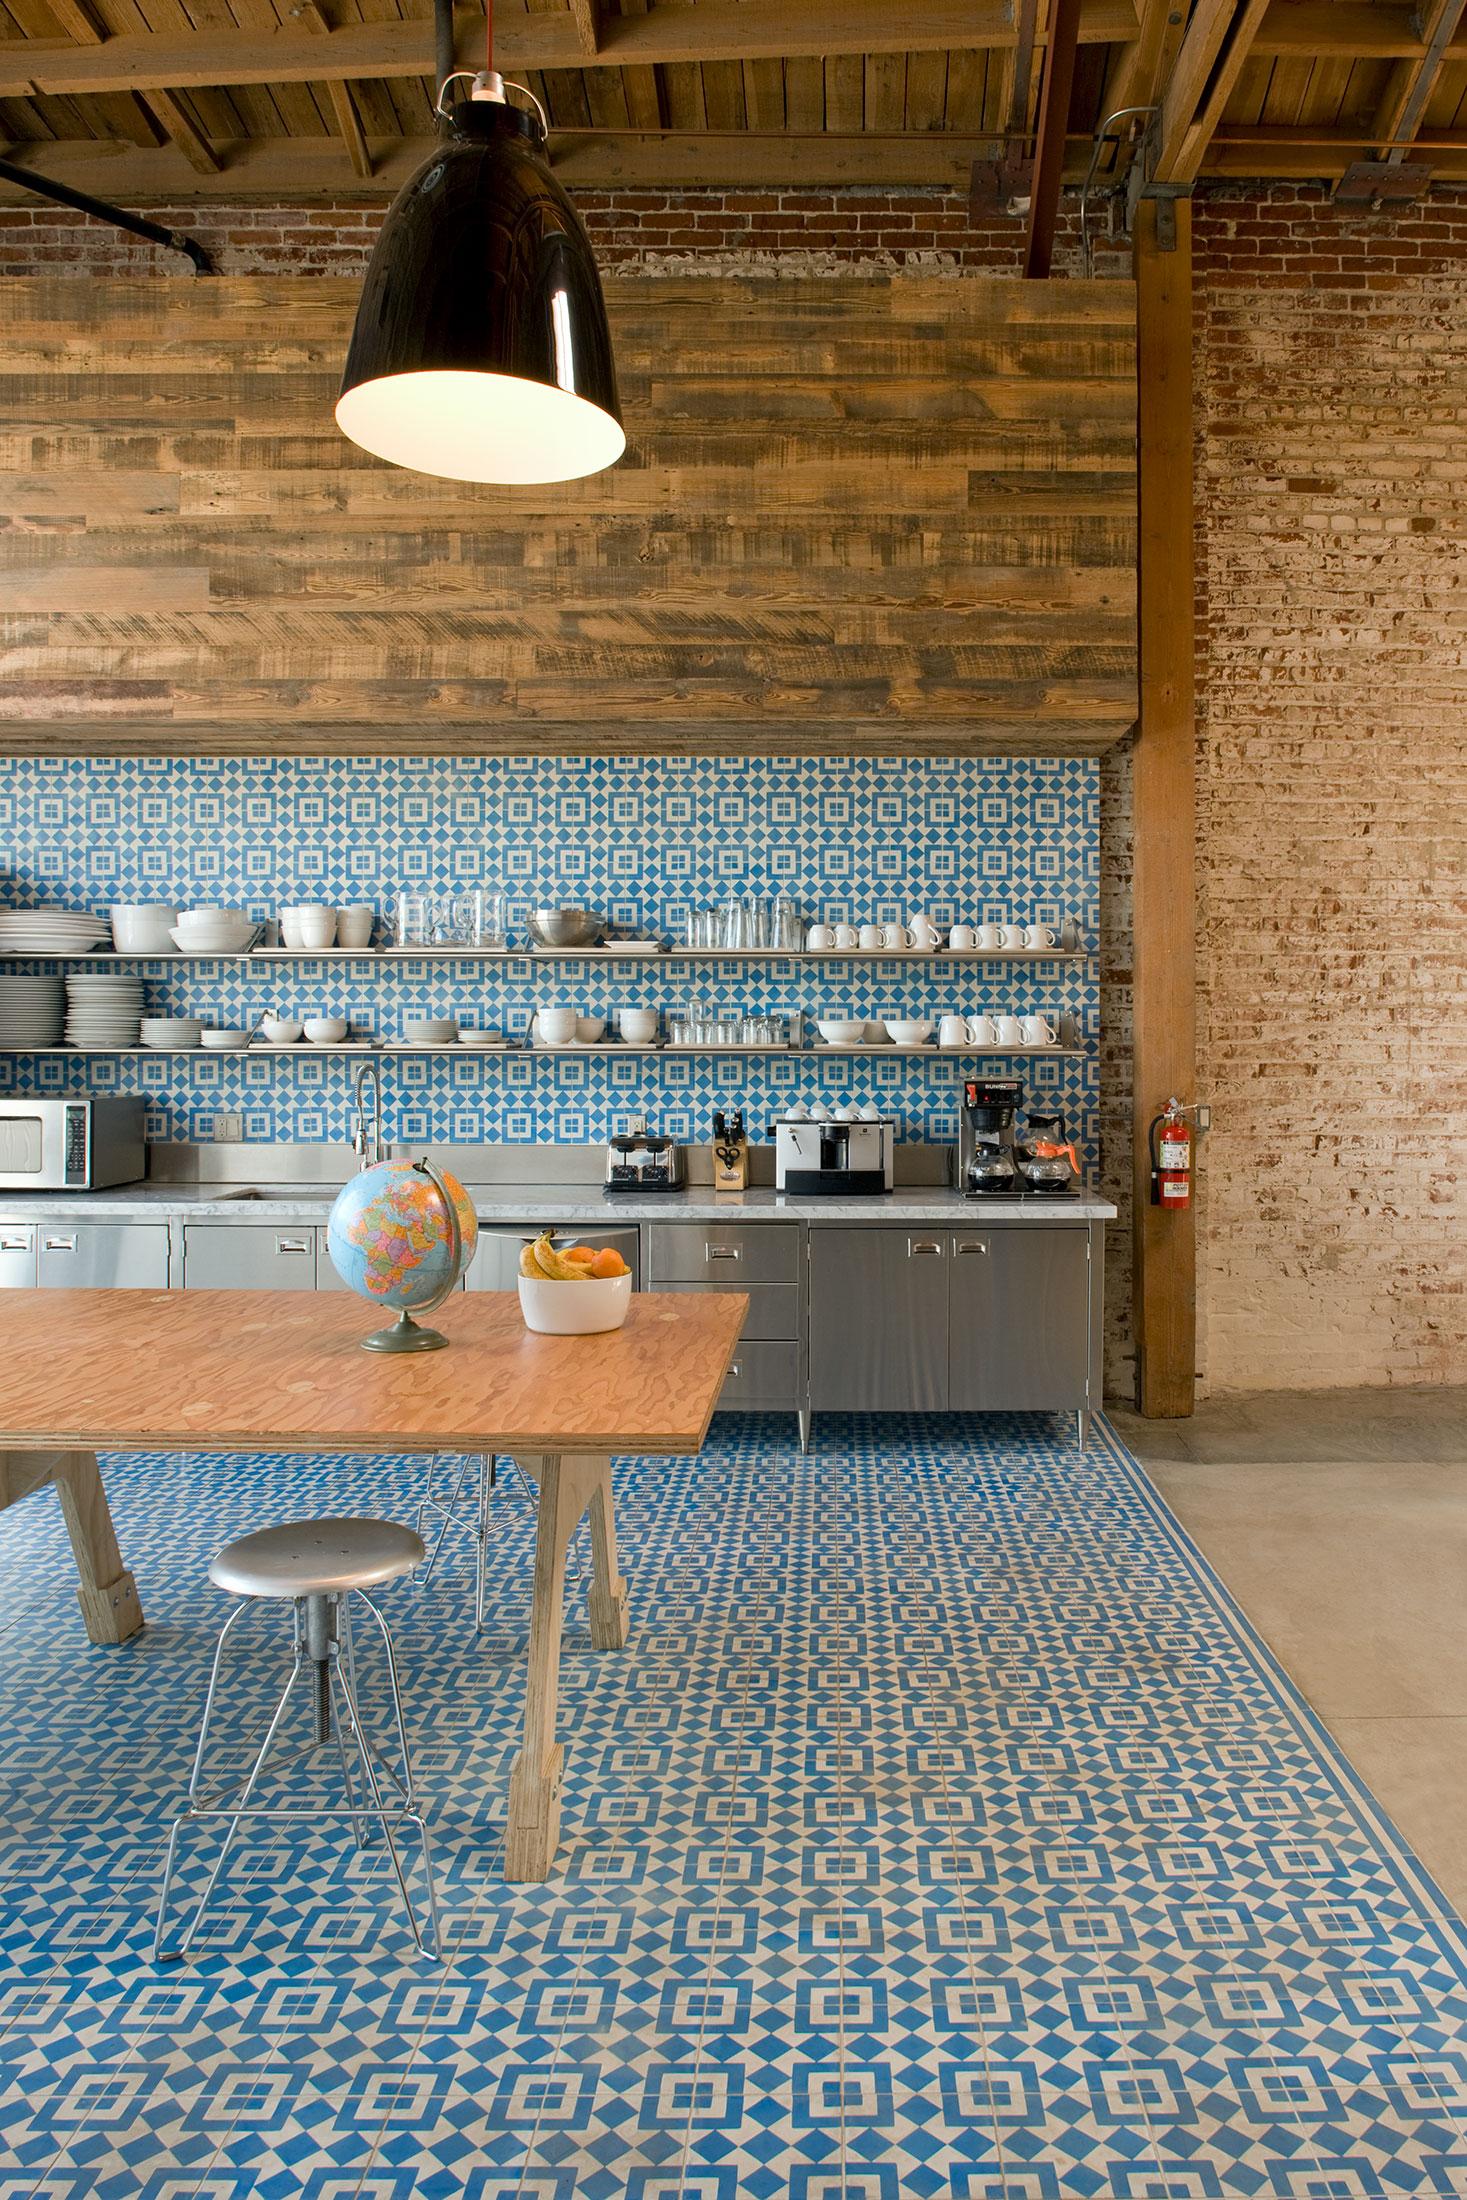 modern-architecture-commercial-interiors-creative-office-kitchen-california-shubindonaldson-biscuit-filmworks-01